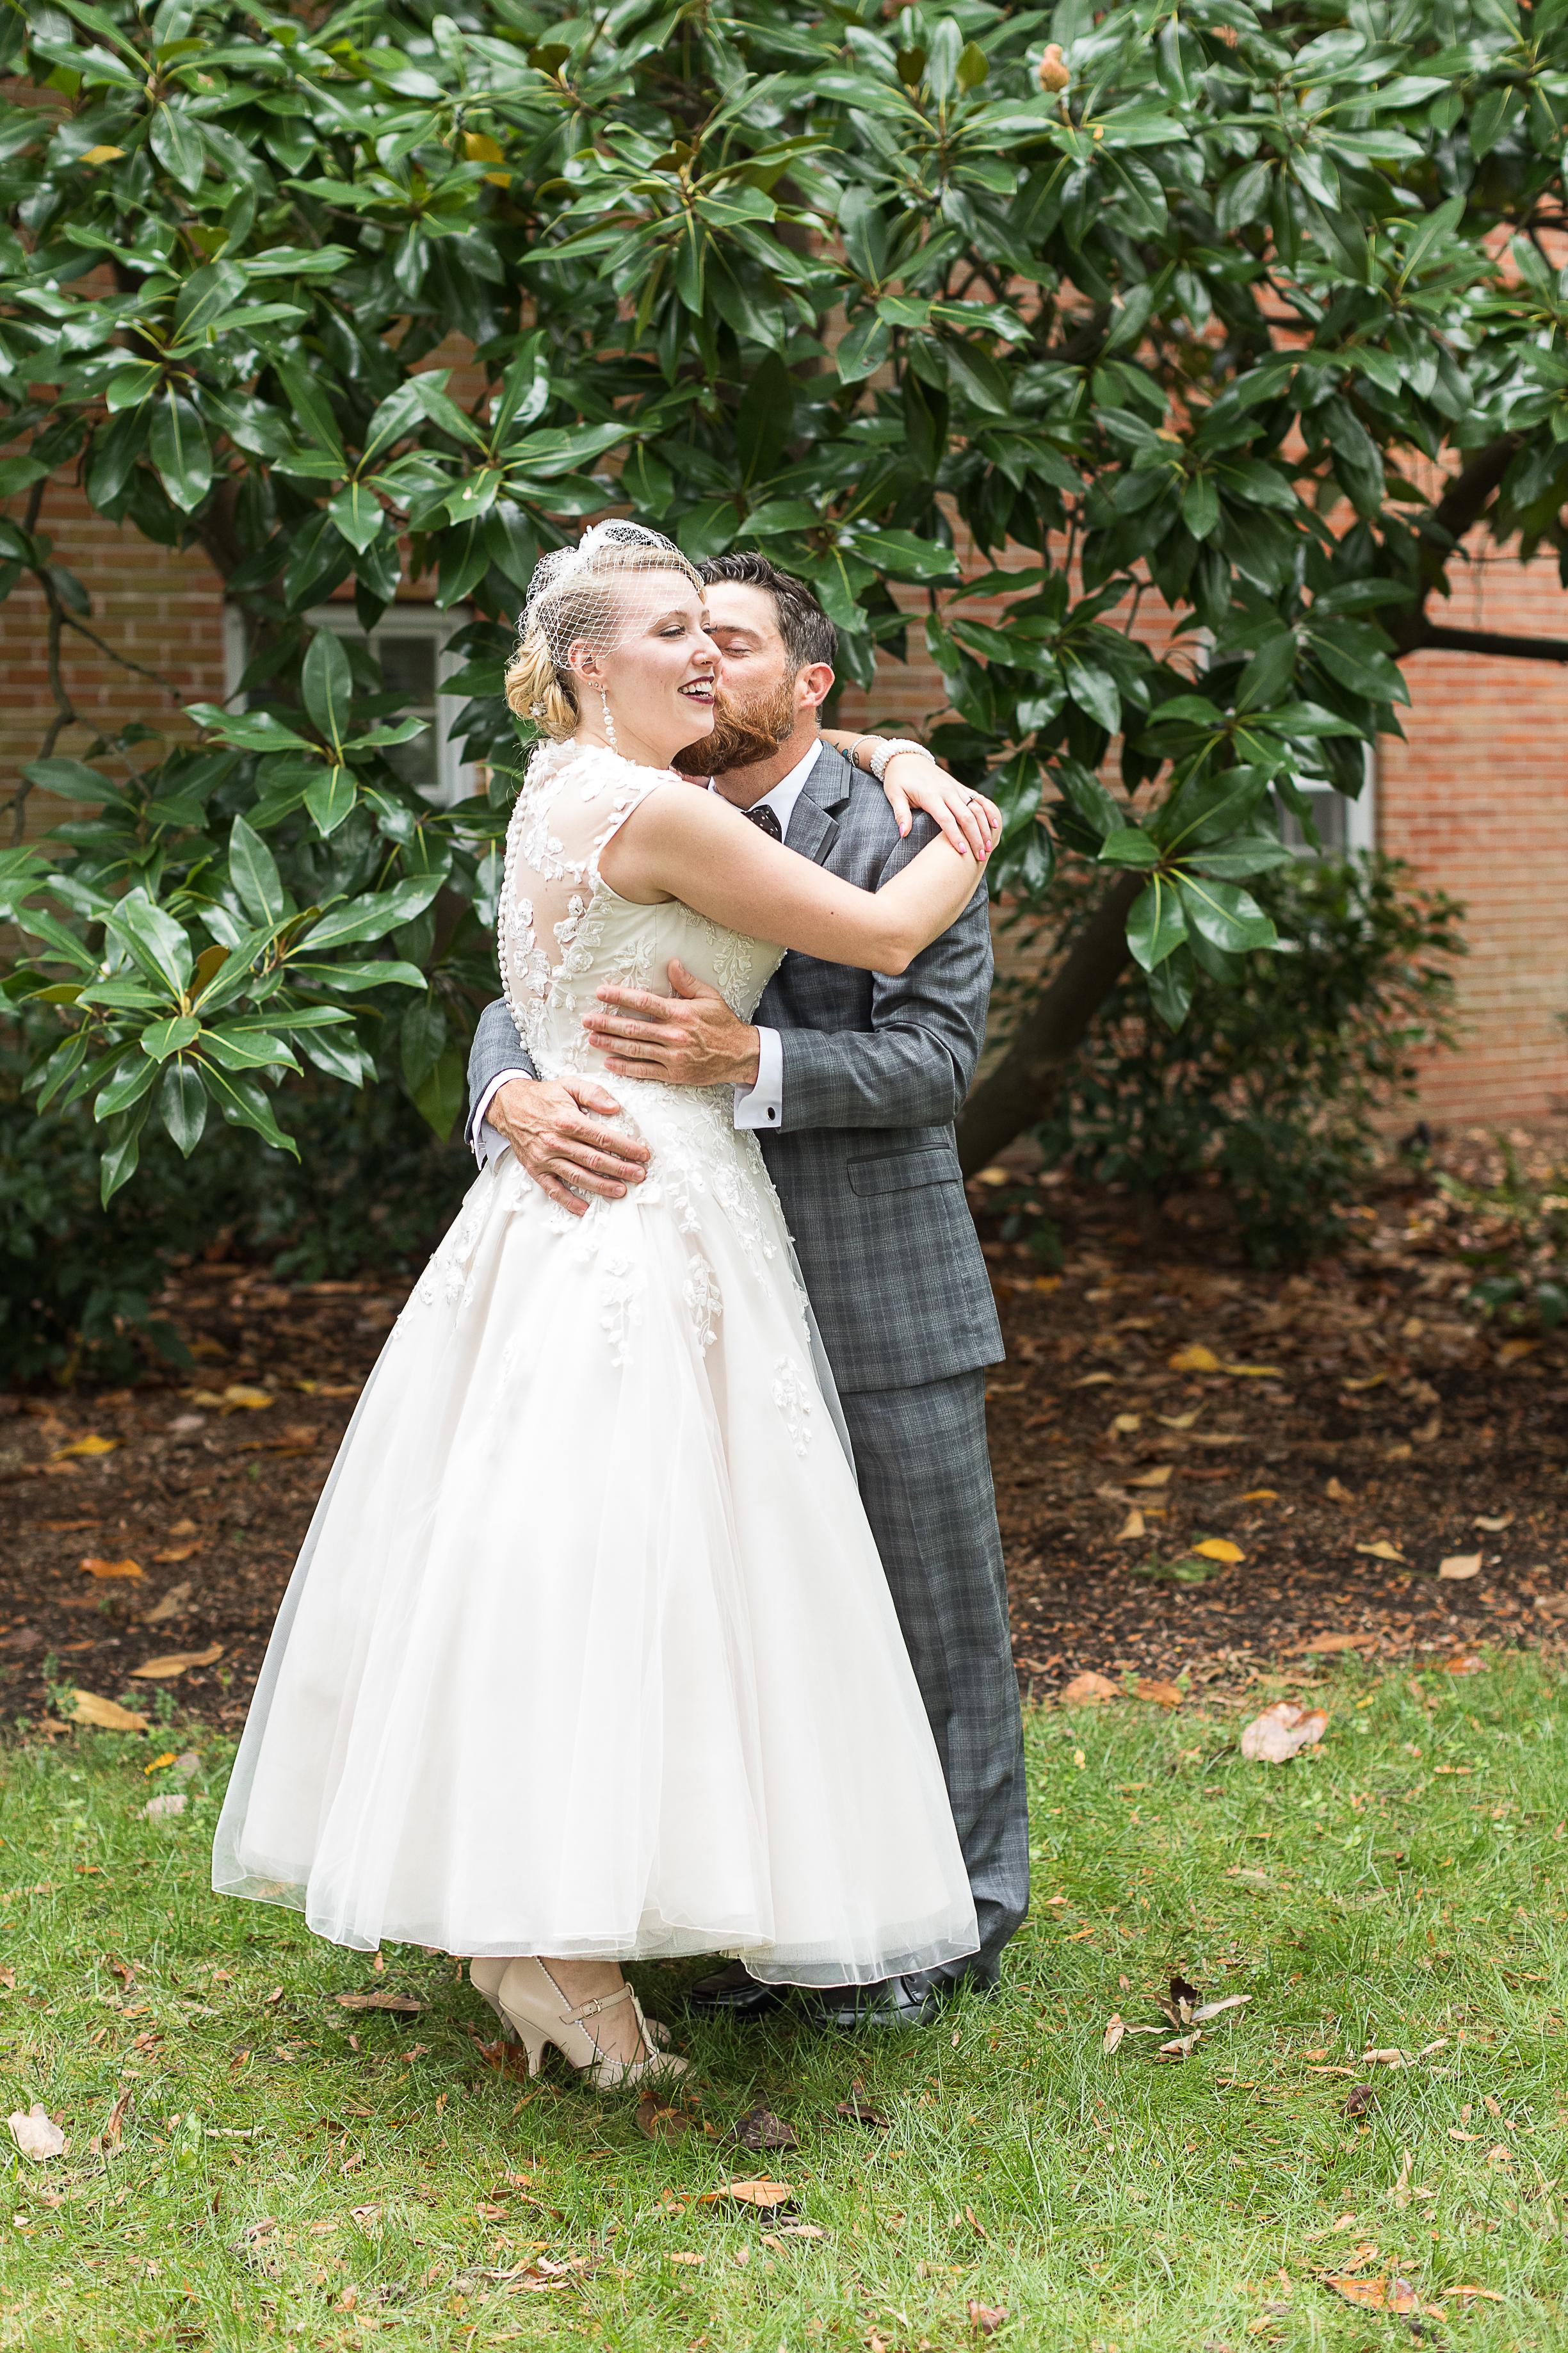 10-18-Ashleigh-RJ-Wedding-Kim-Pham-Clark-Photography.jpg